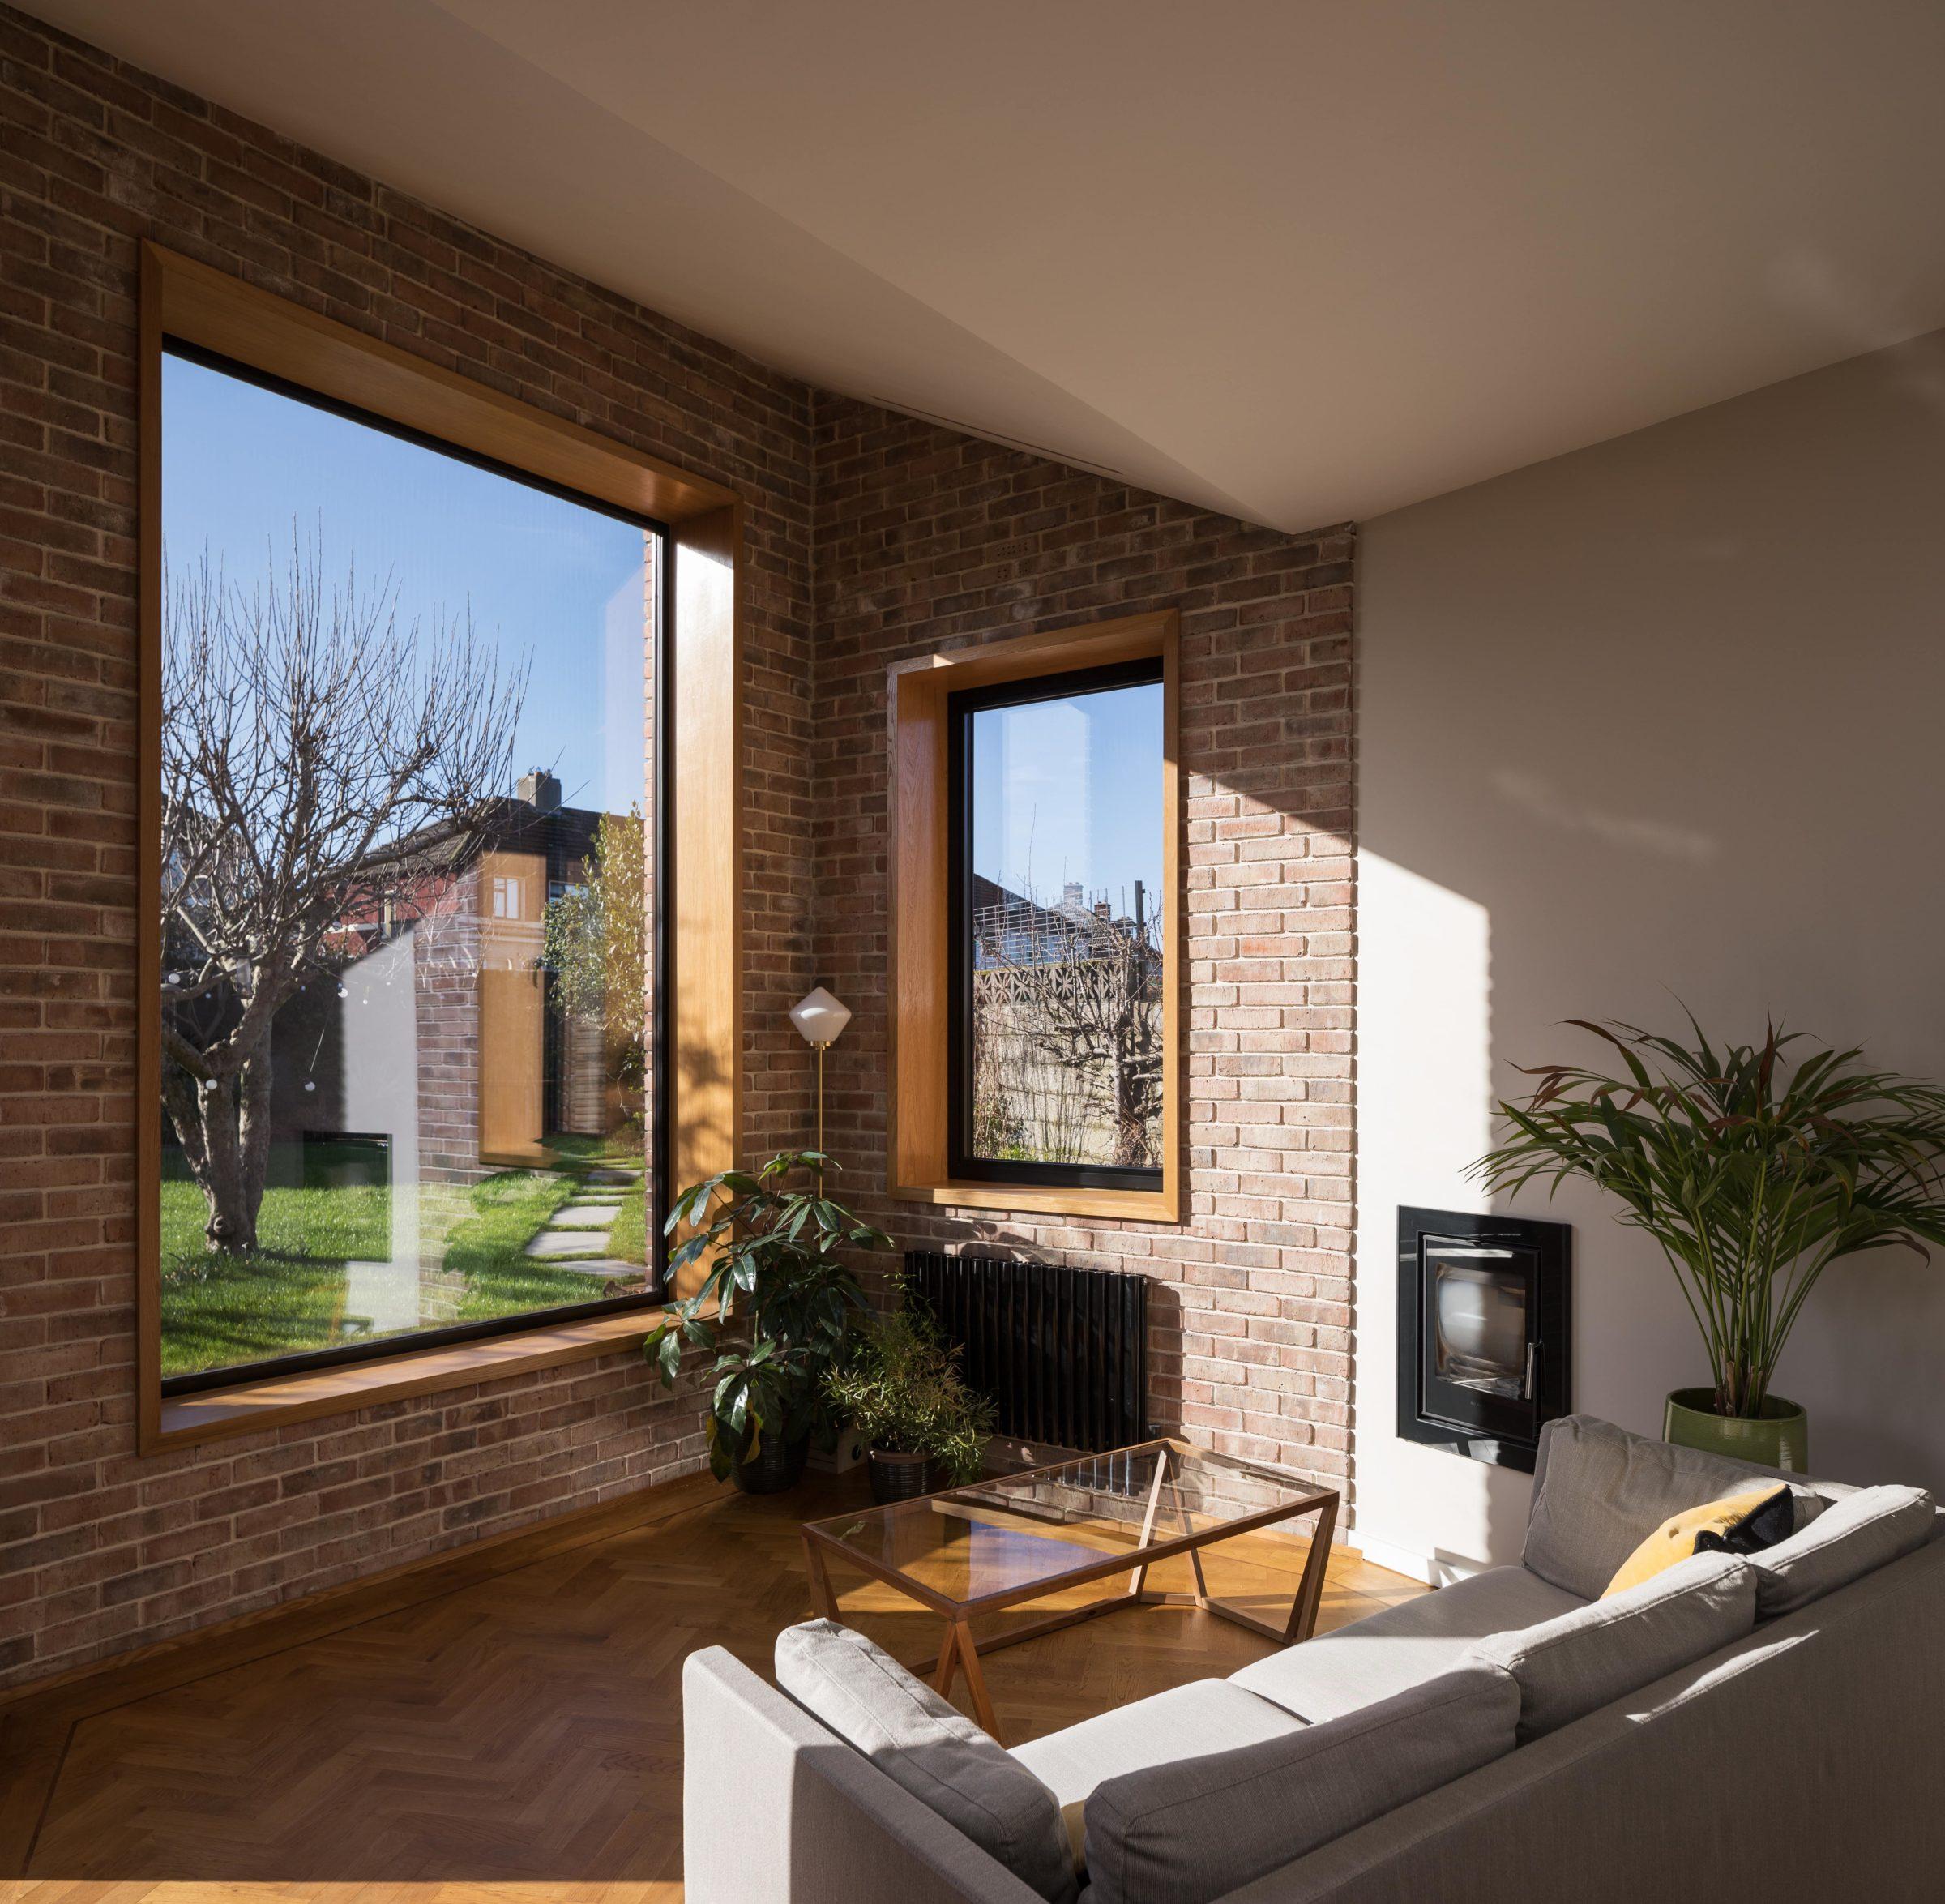 Architectural Farm_Garden Room (8)Andrew Campion